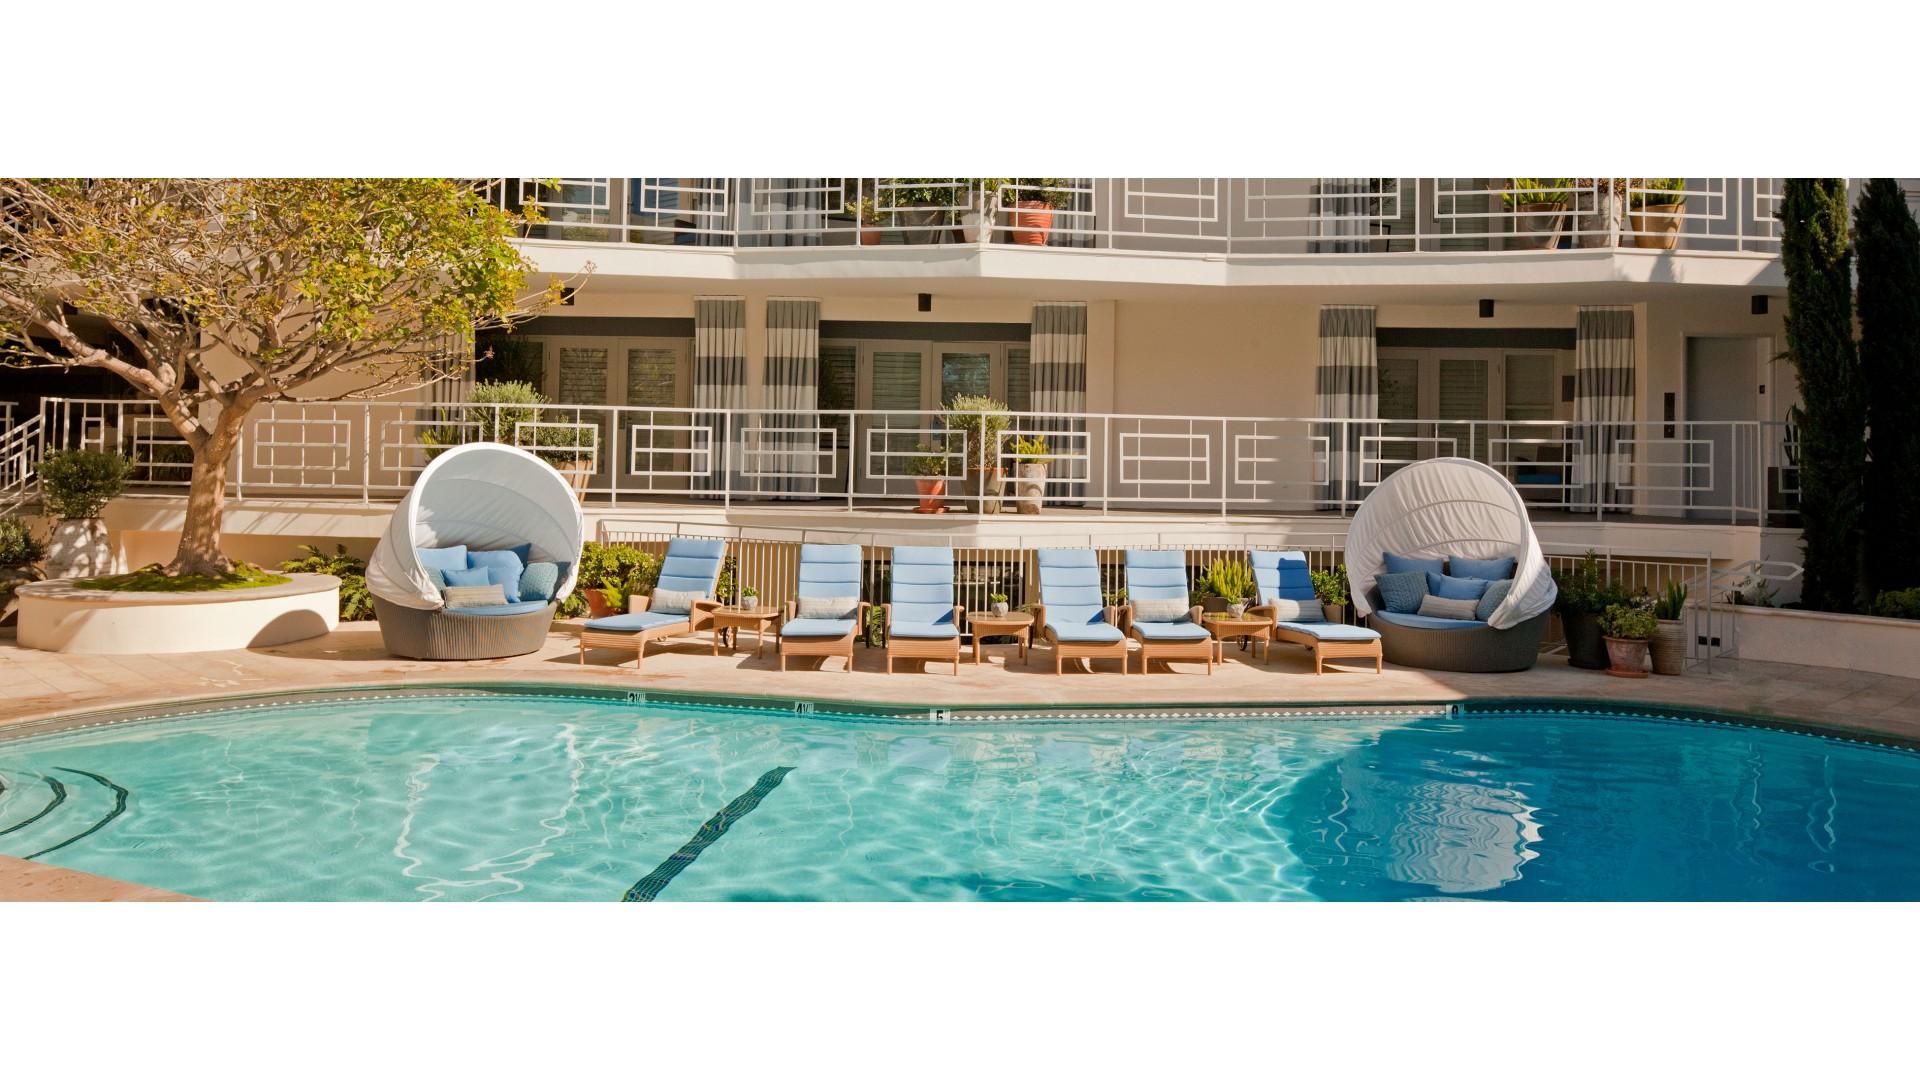 Best Kitchen Gallery: Oceana Beach Club Hotel Santa Monica Los Angeles California of Los Angeles Hotel Resorts  on rachelxblog.com